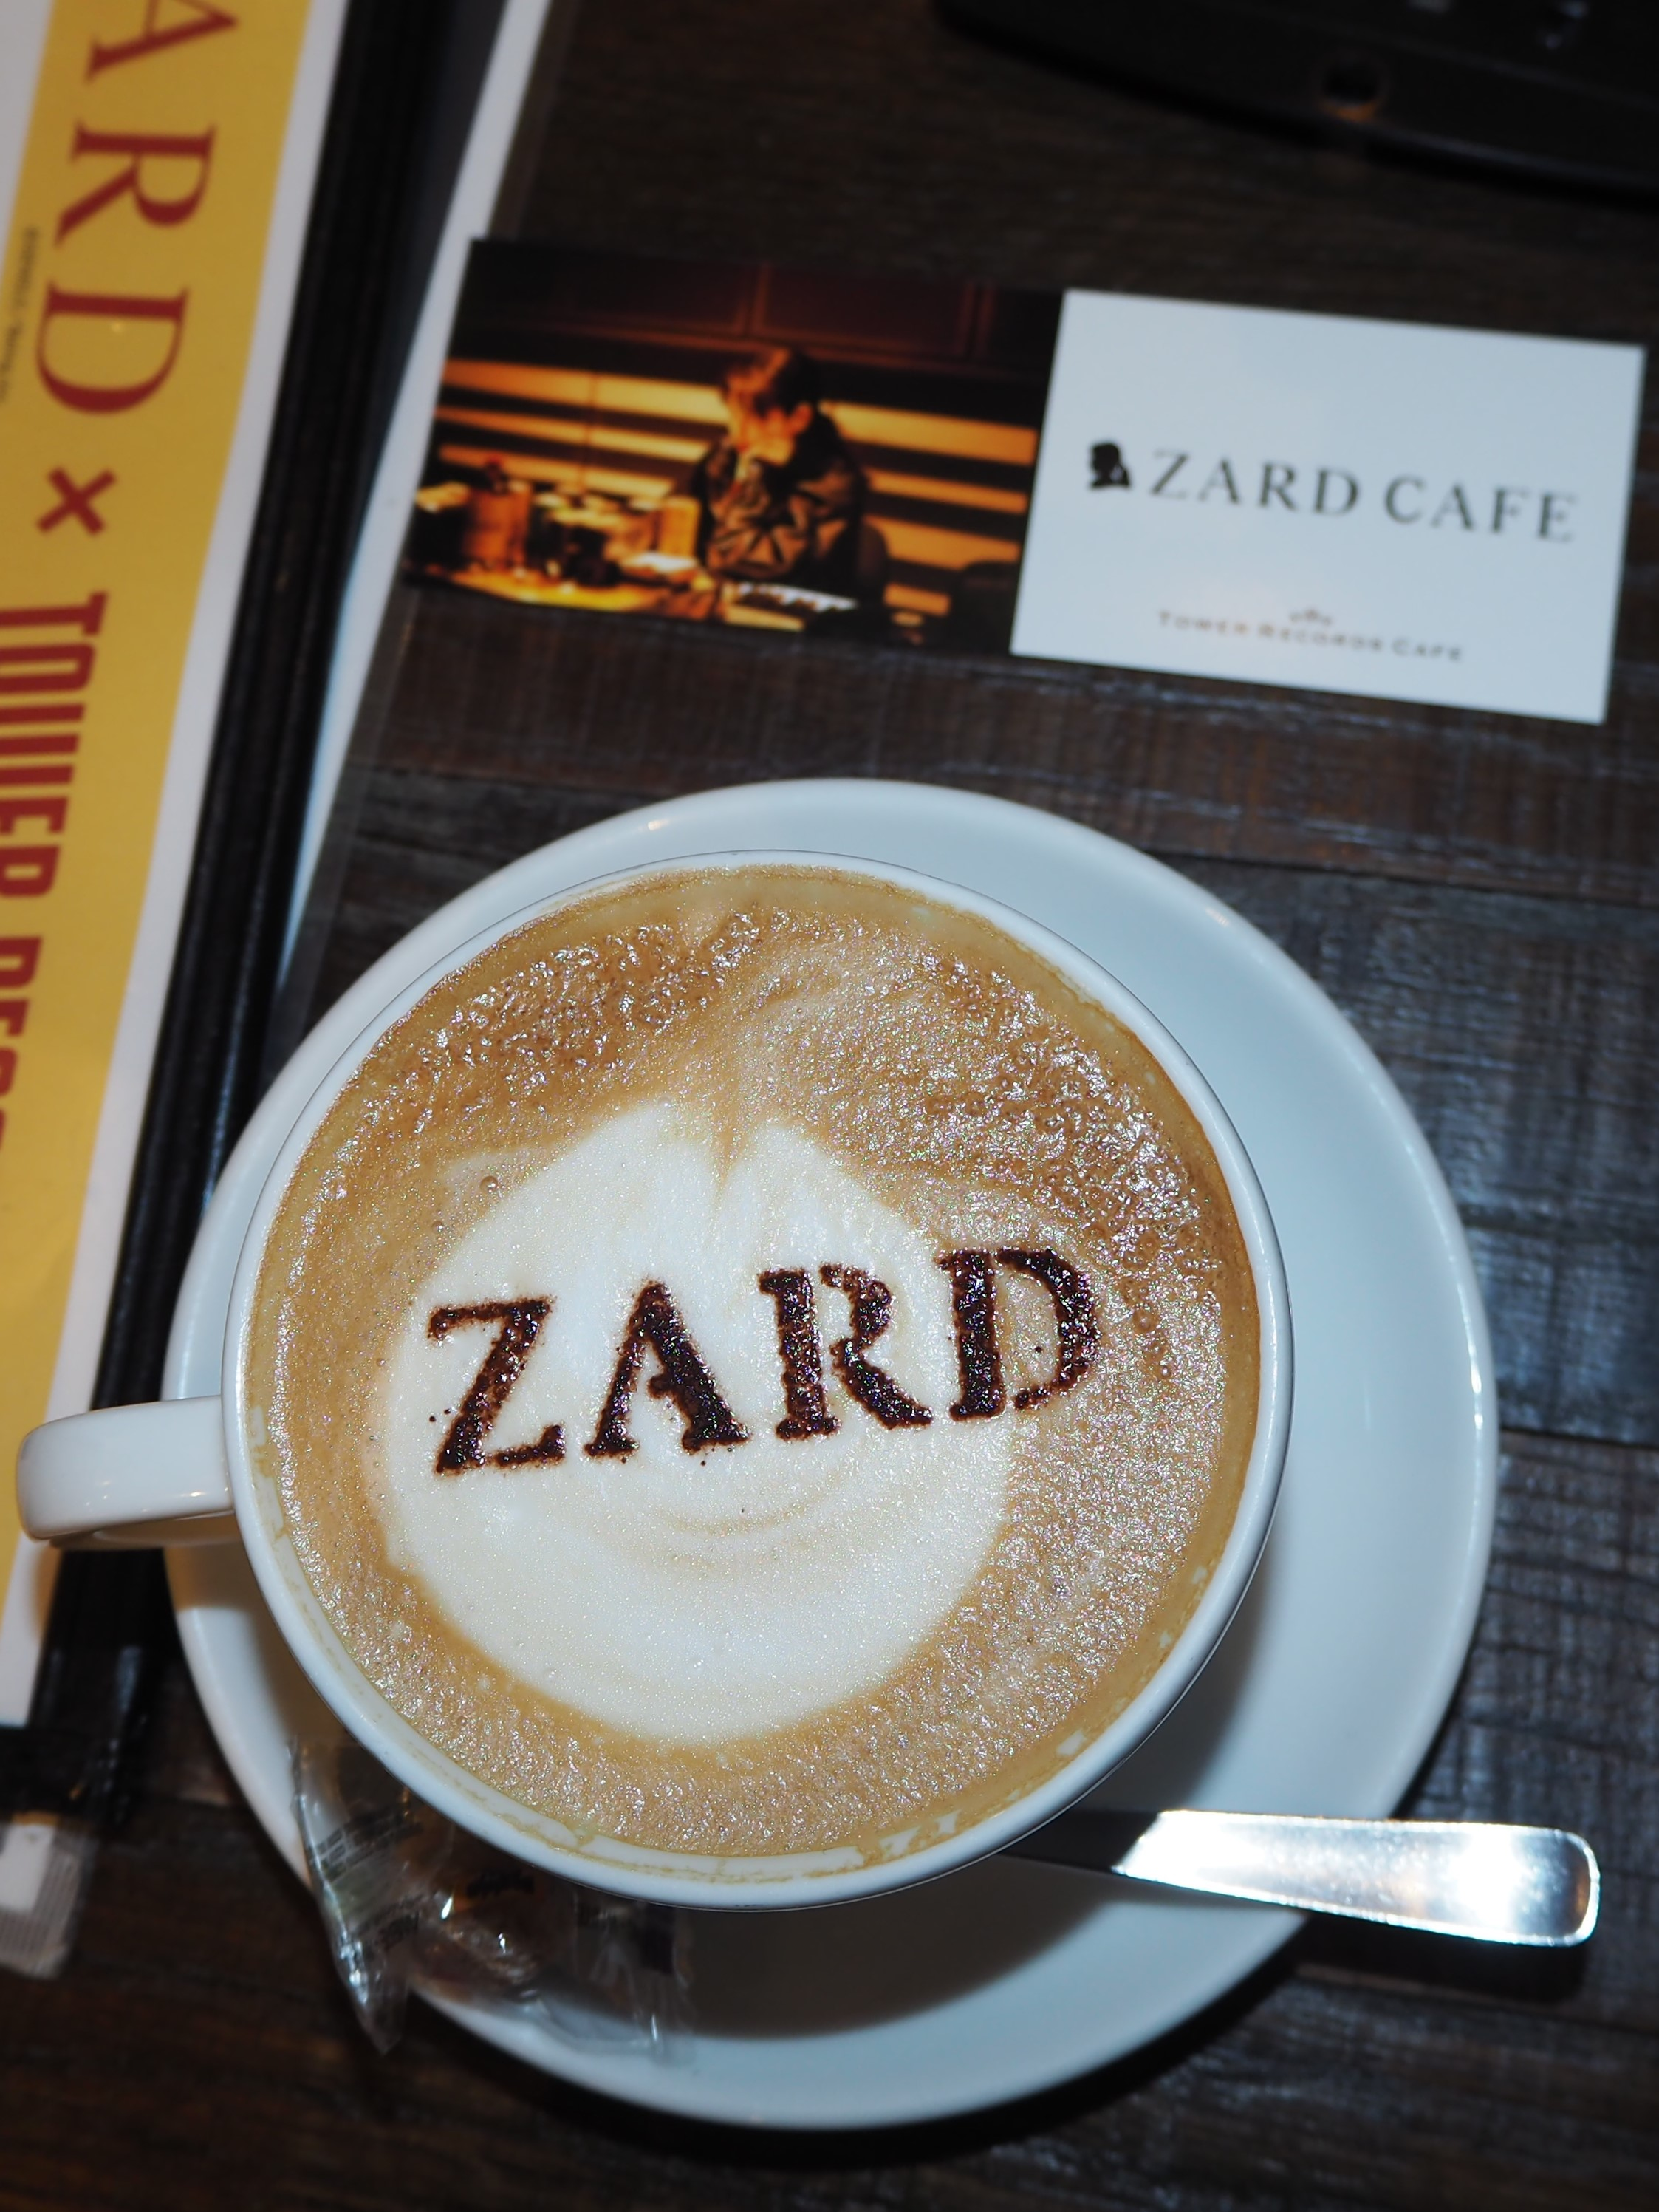 Zard カフェ